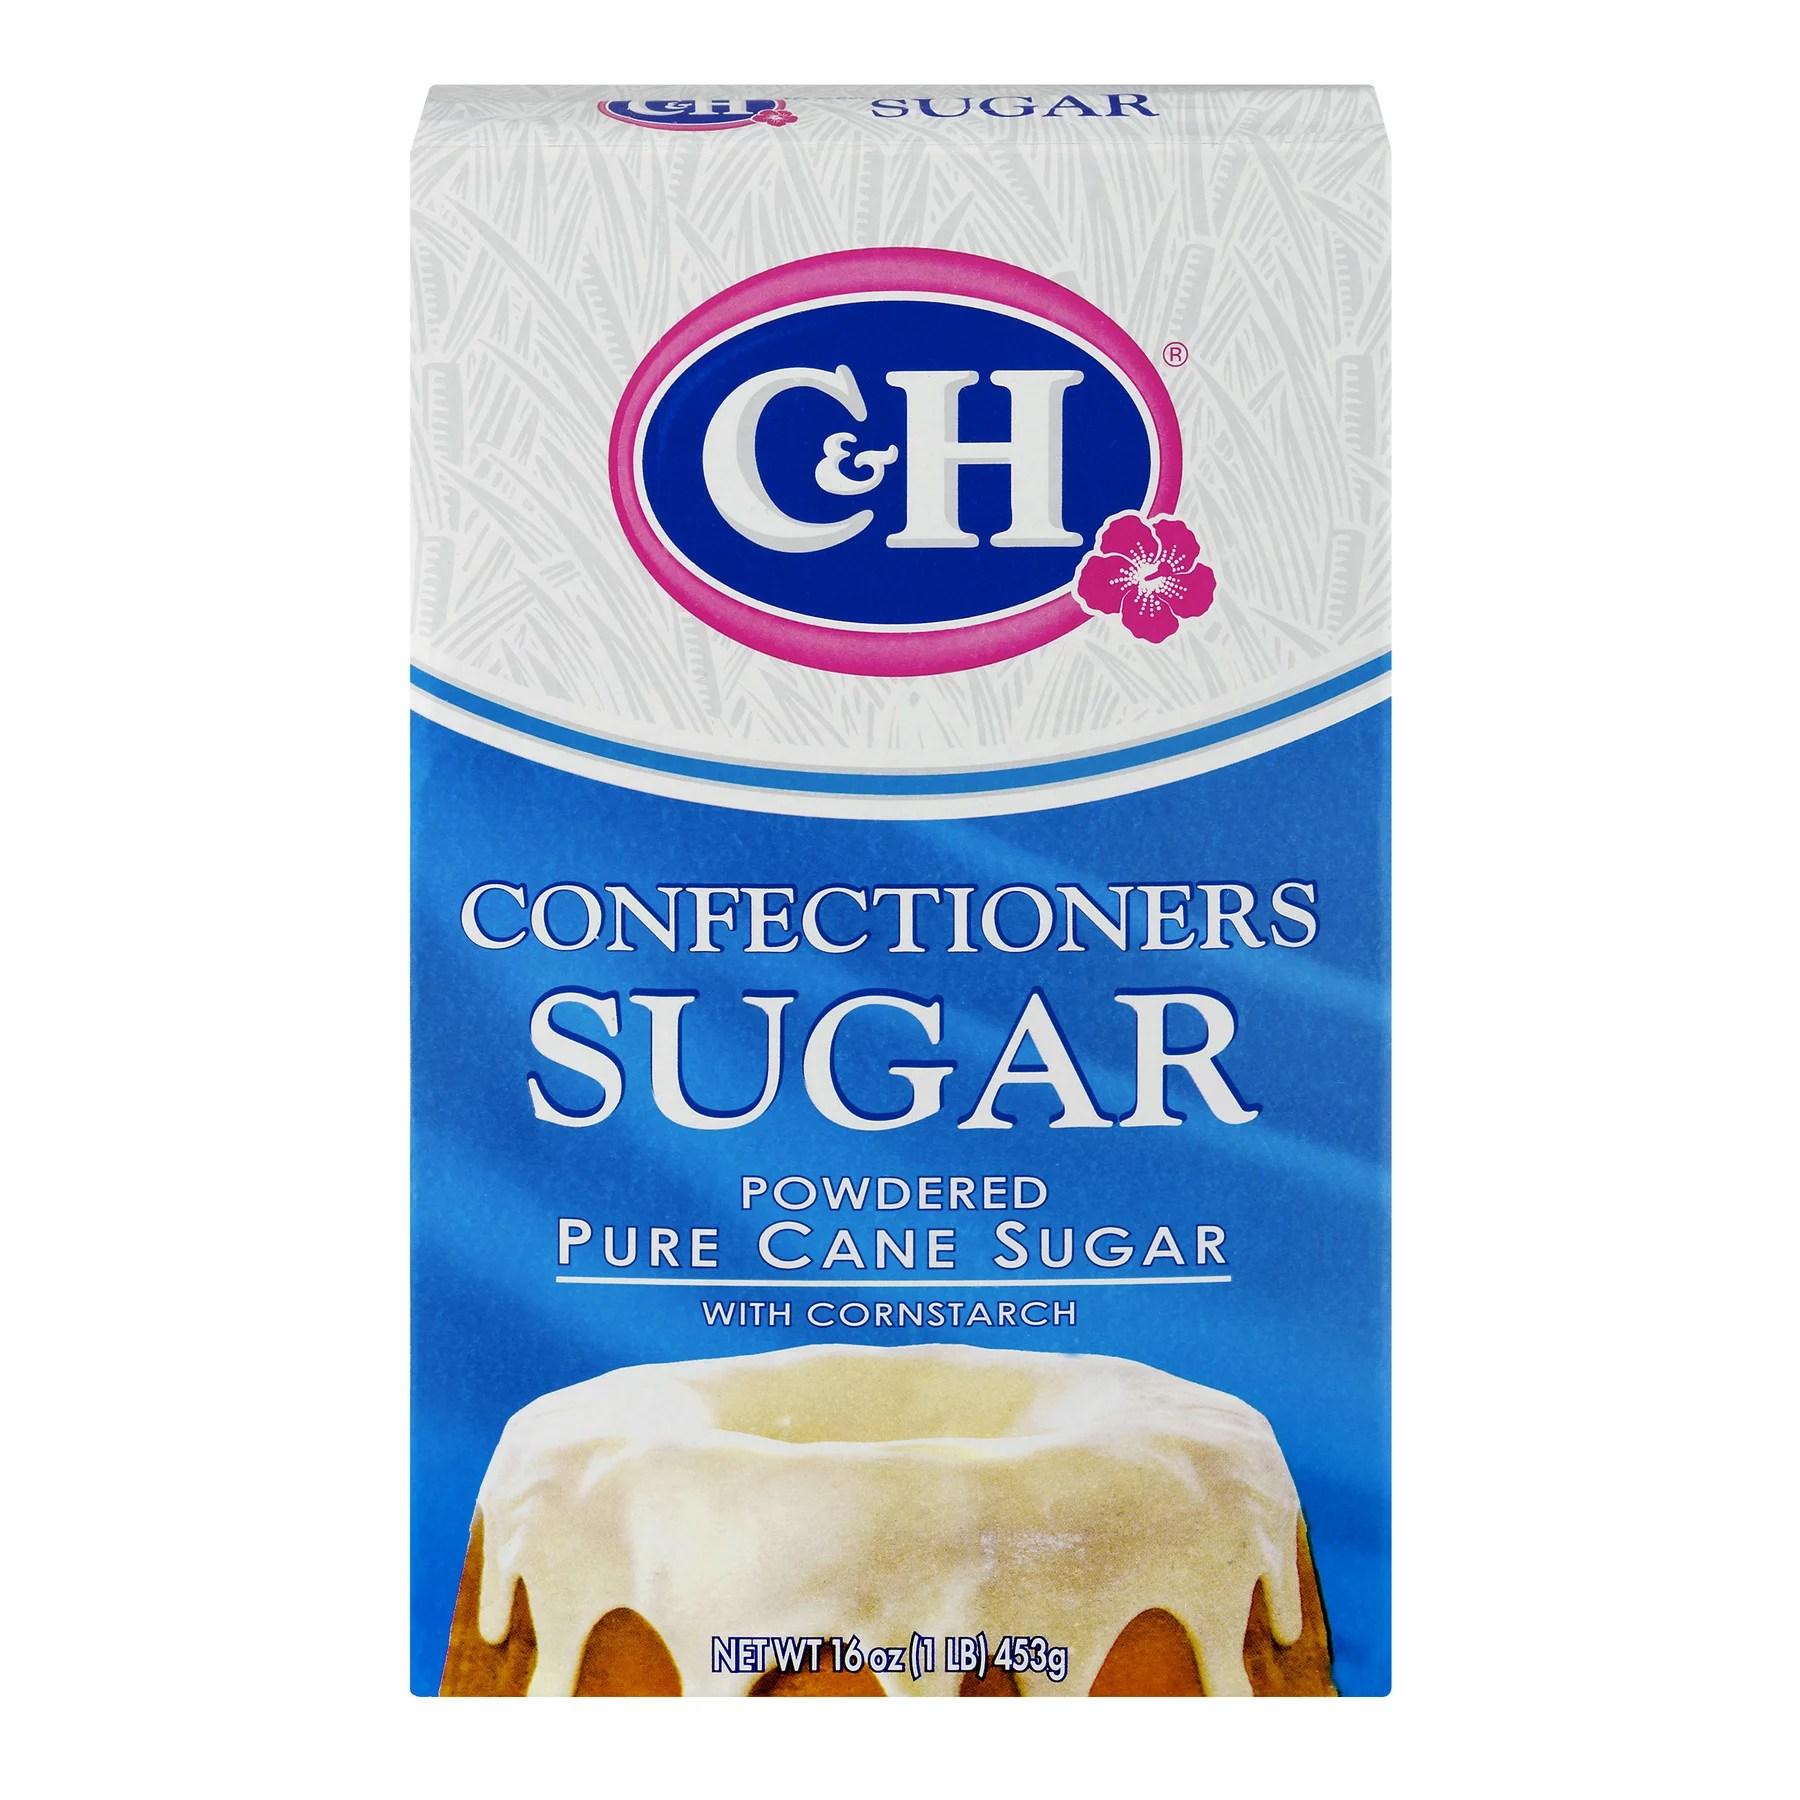 (5 Pack) C&H Pure Cane Sugar Confectioners Powdered 1 lb Box - Walmart.com - Walmart.com